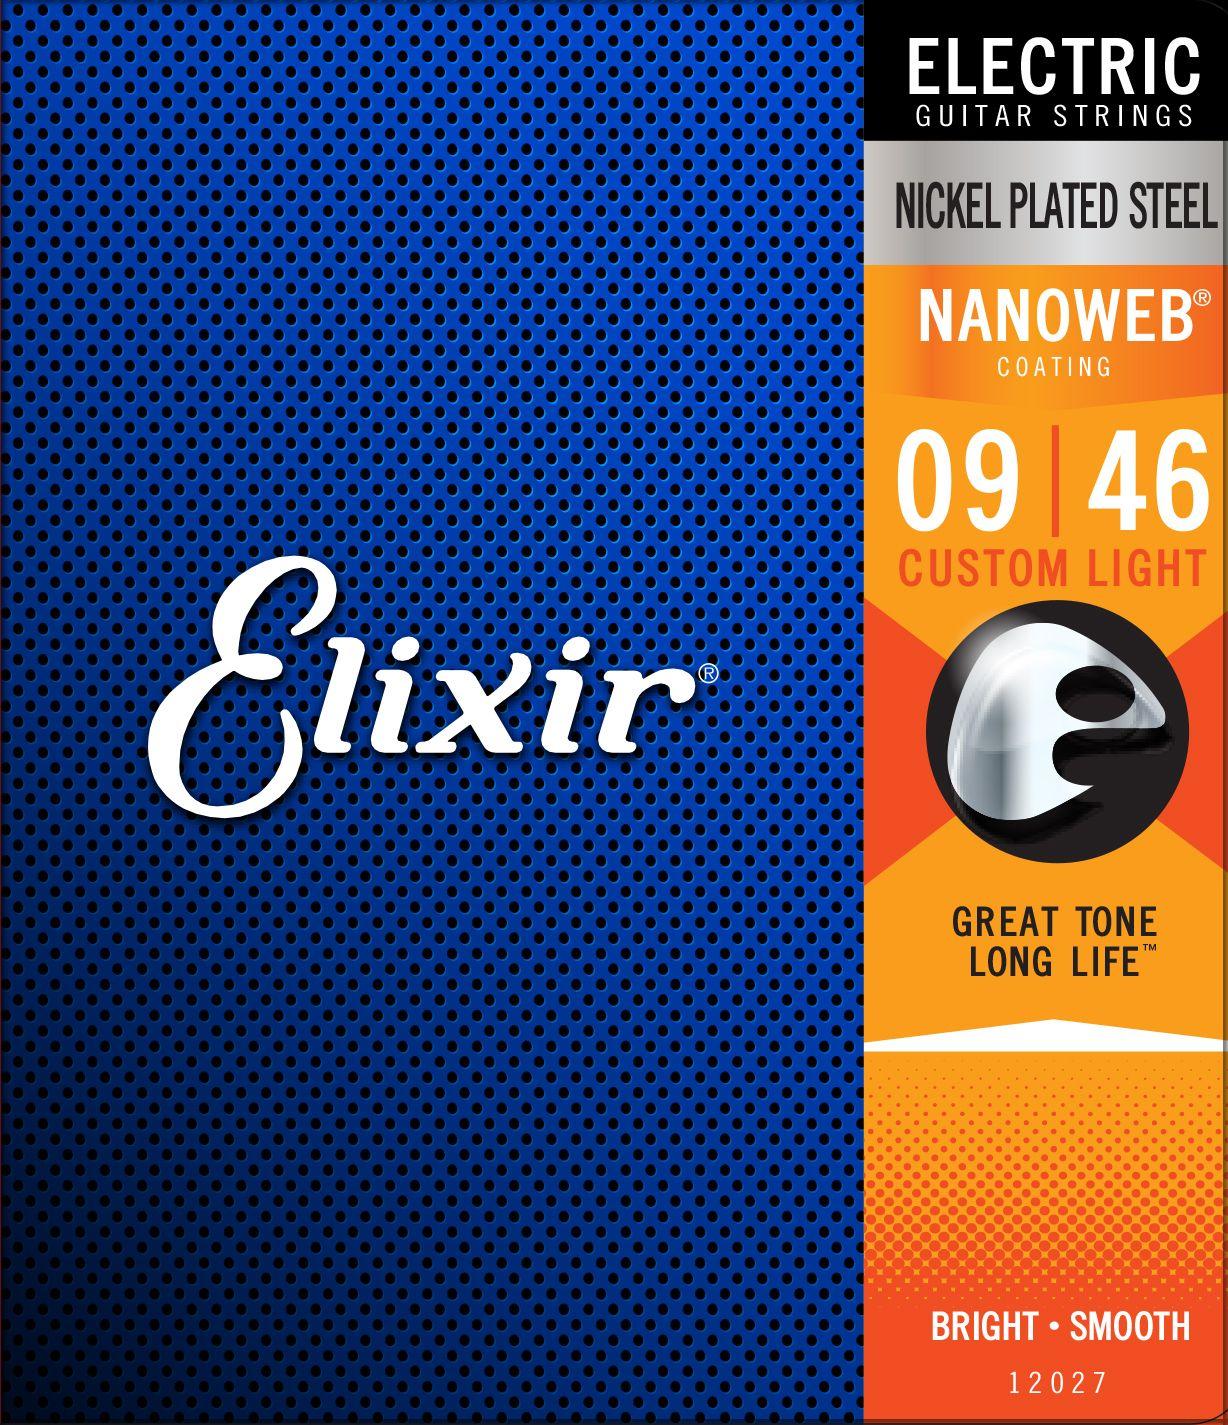 Elixir Nanoweb Custom Light 09-46